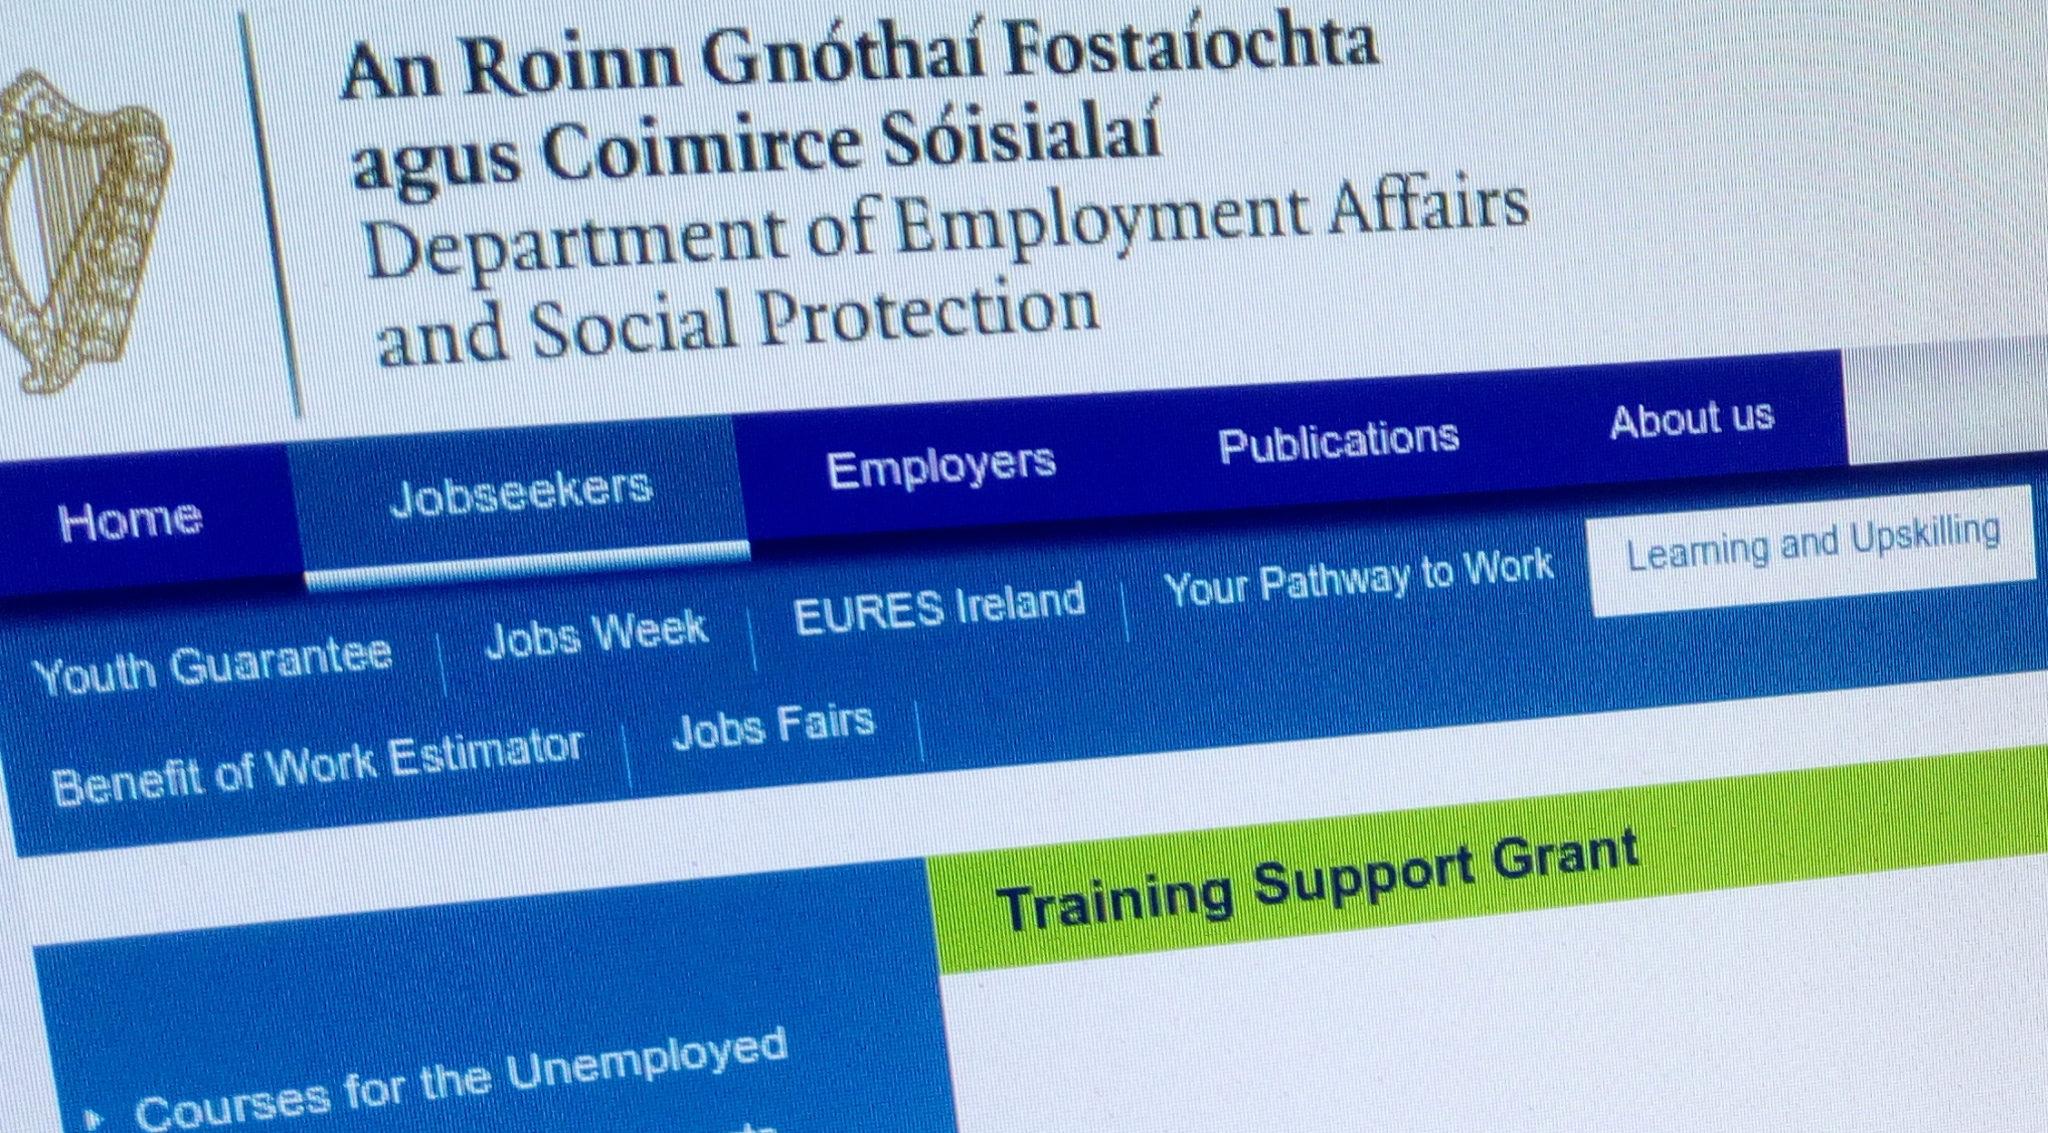 Training Support Grant